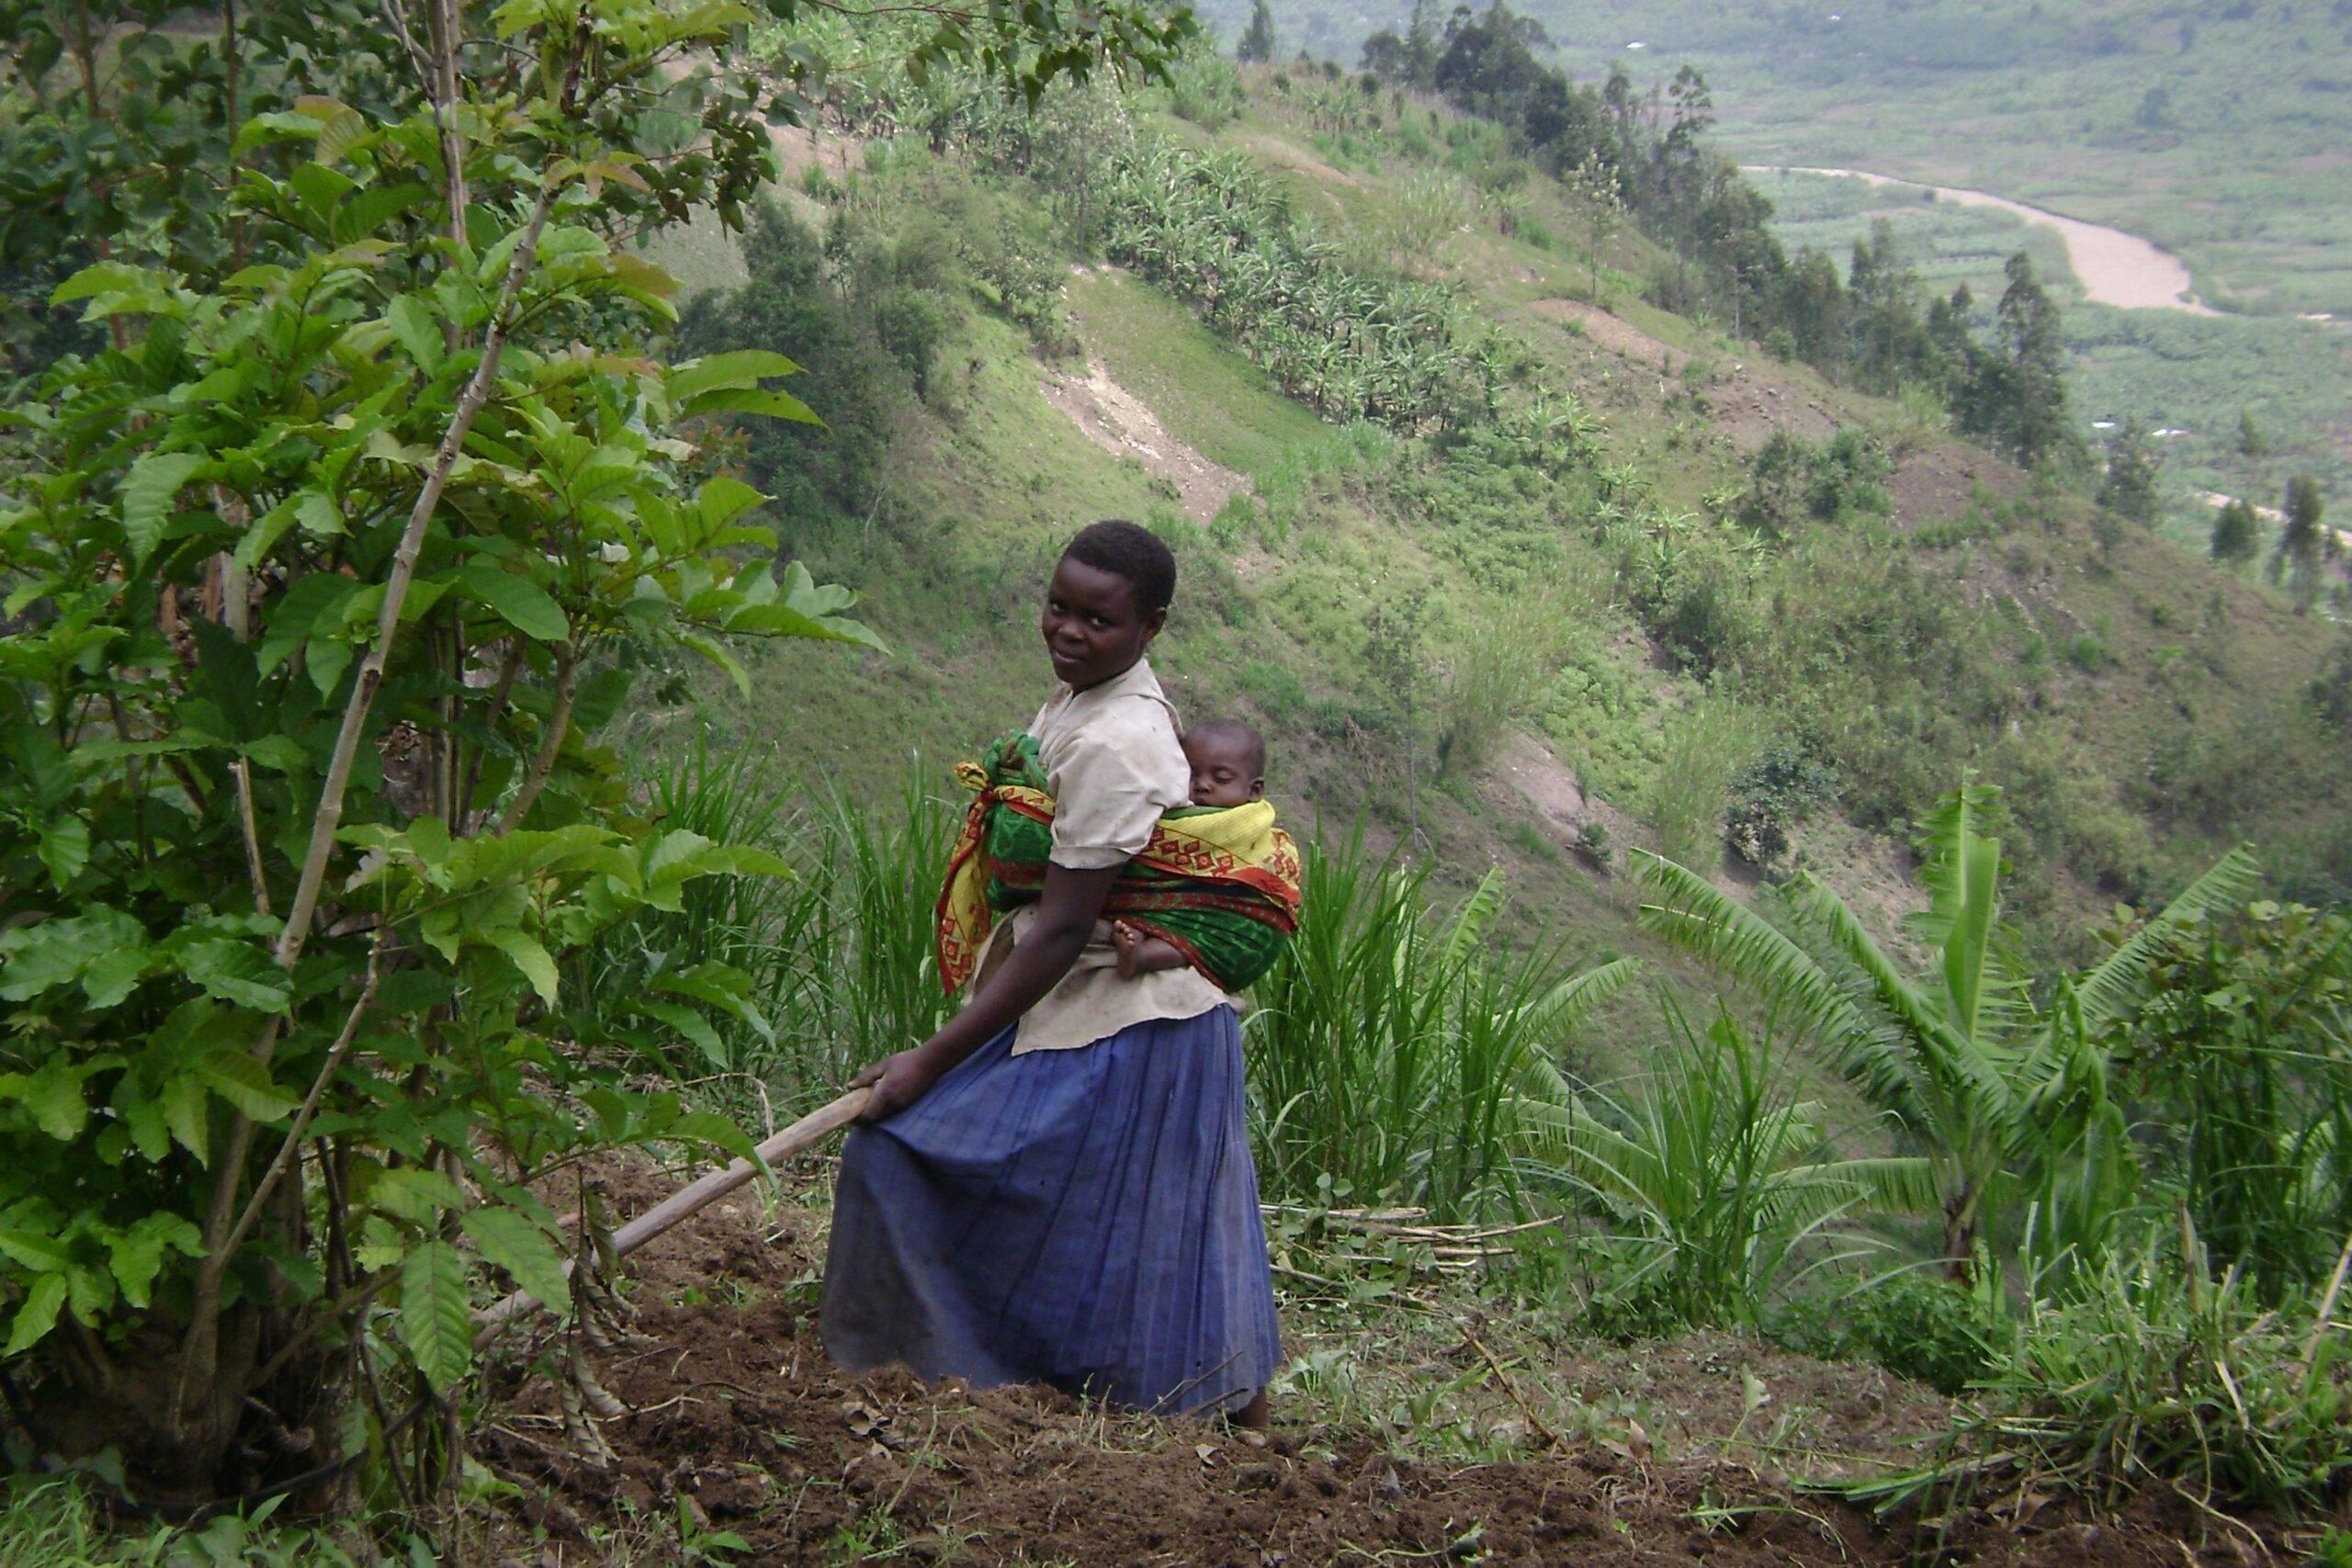 Women working in the hills of Rwanda